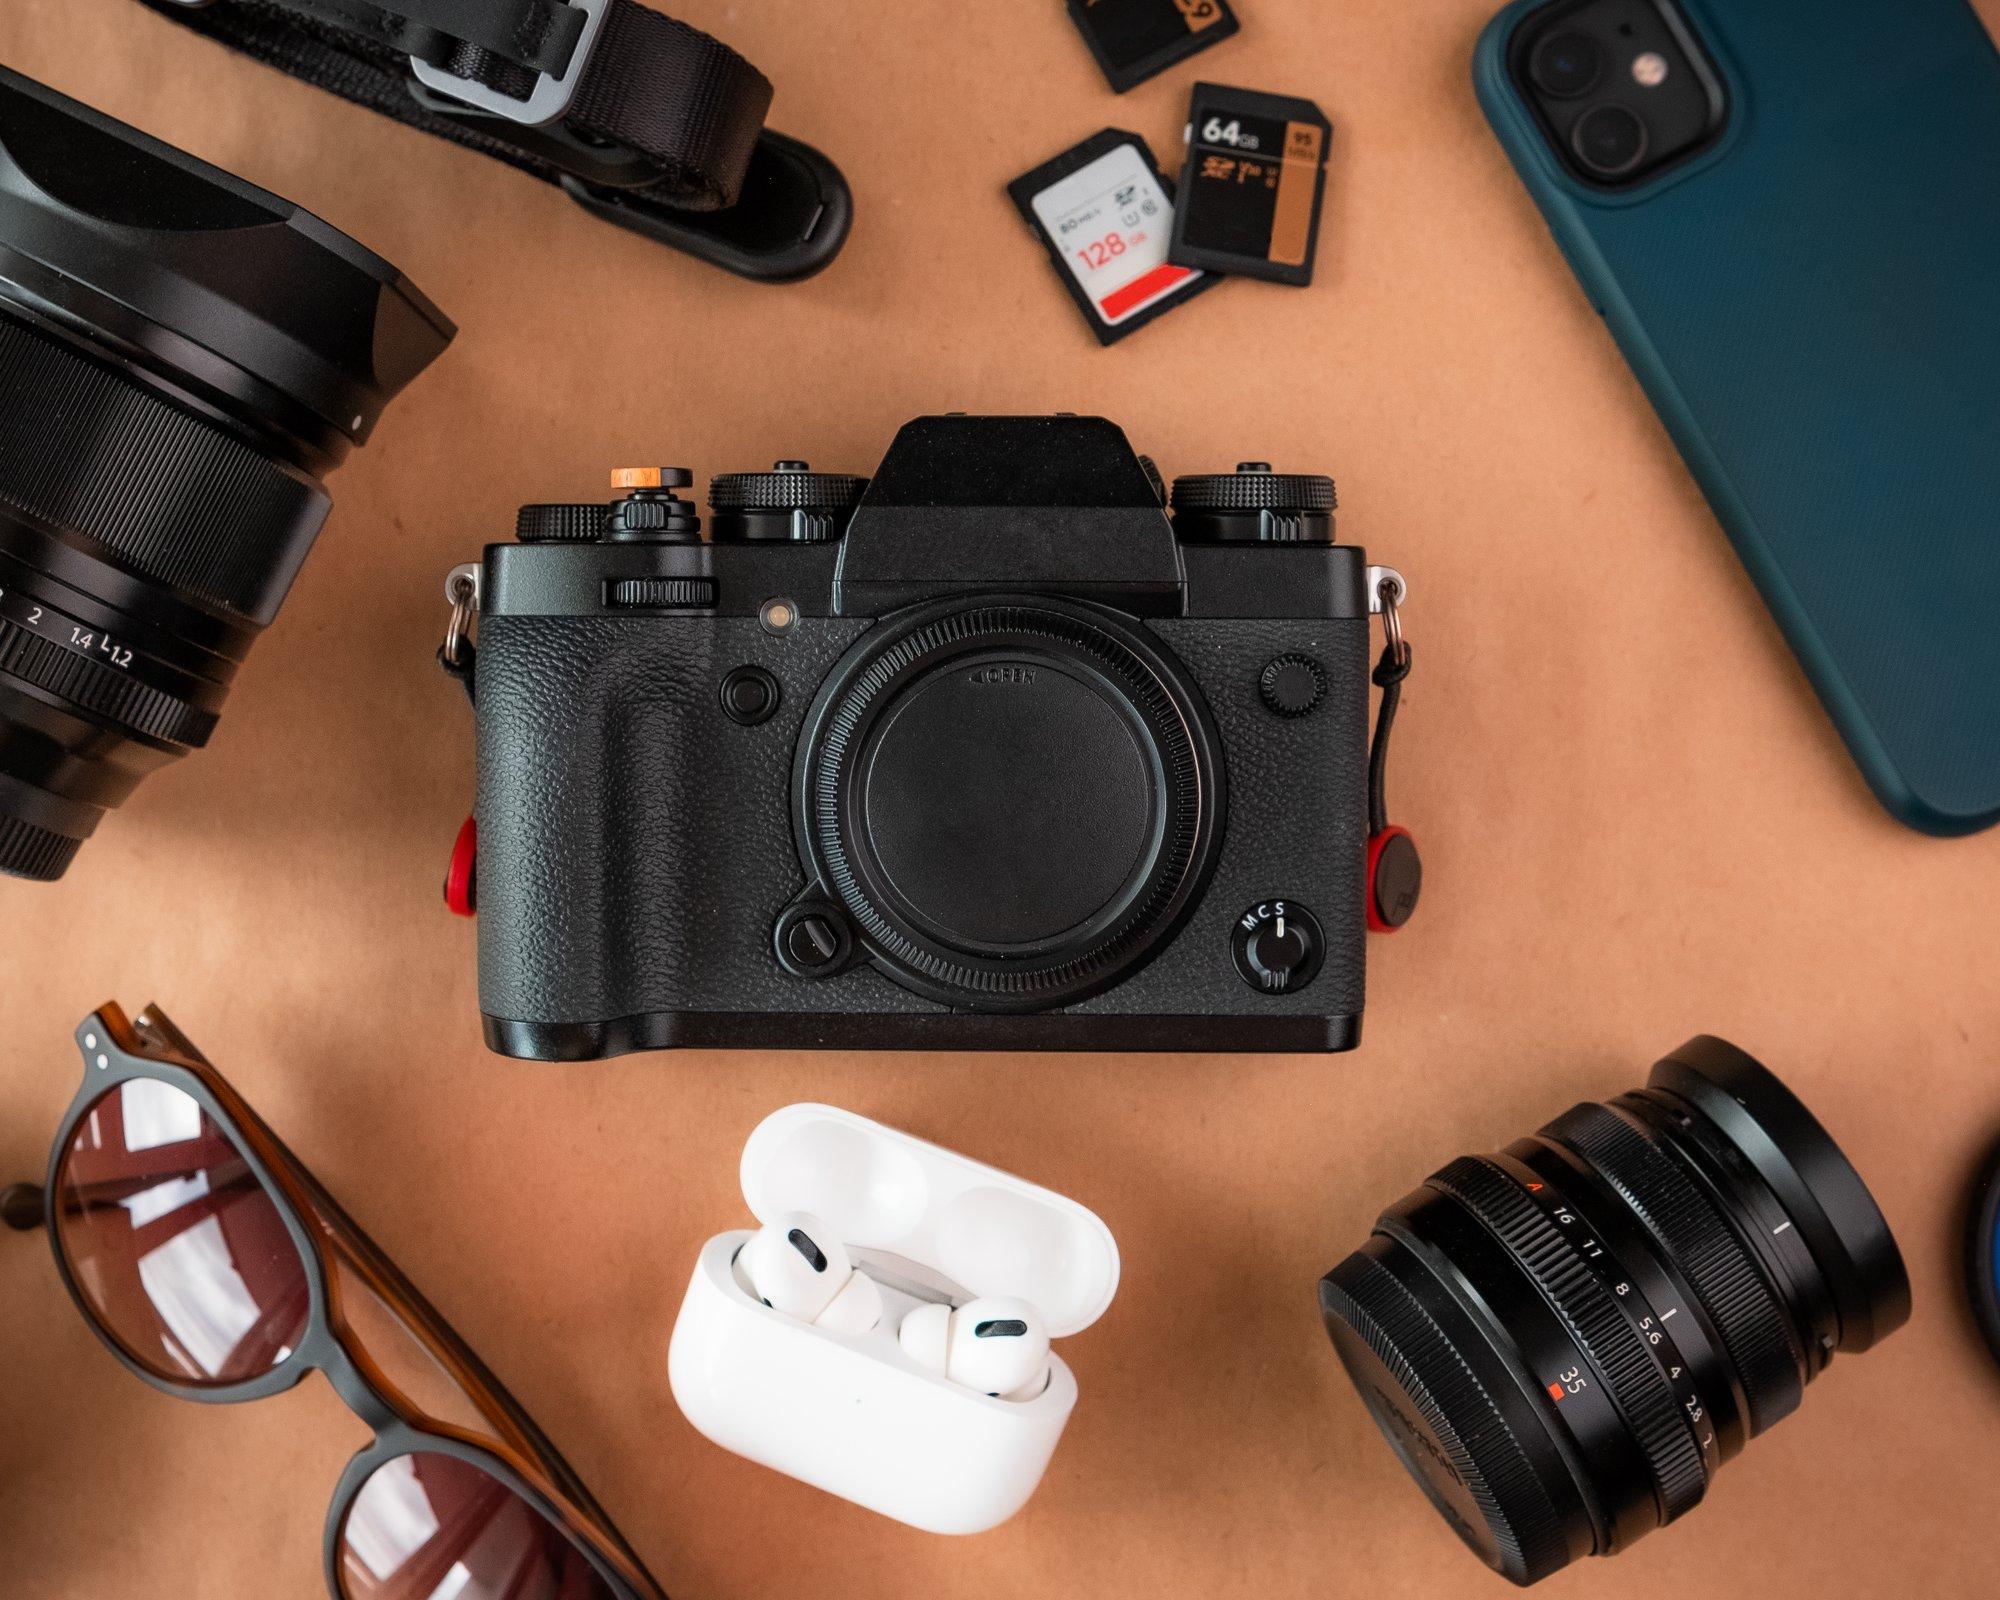 camera lays on brown table surrounded by video equipment 摄像机摆在棕色的桌子上,周围都是视频设备。